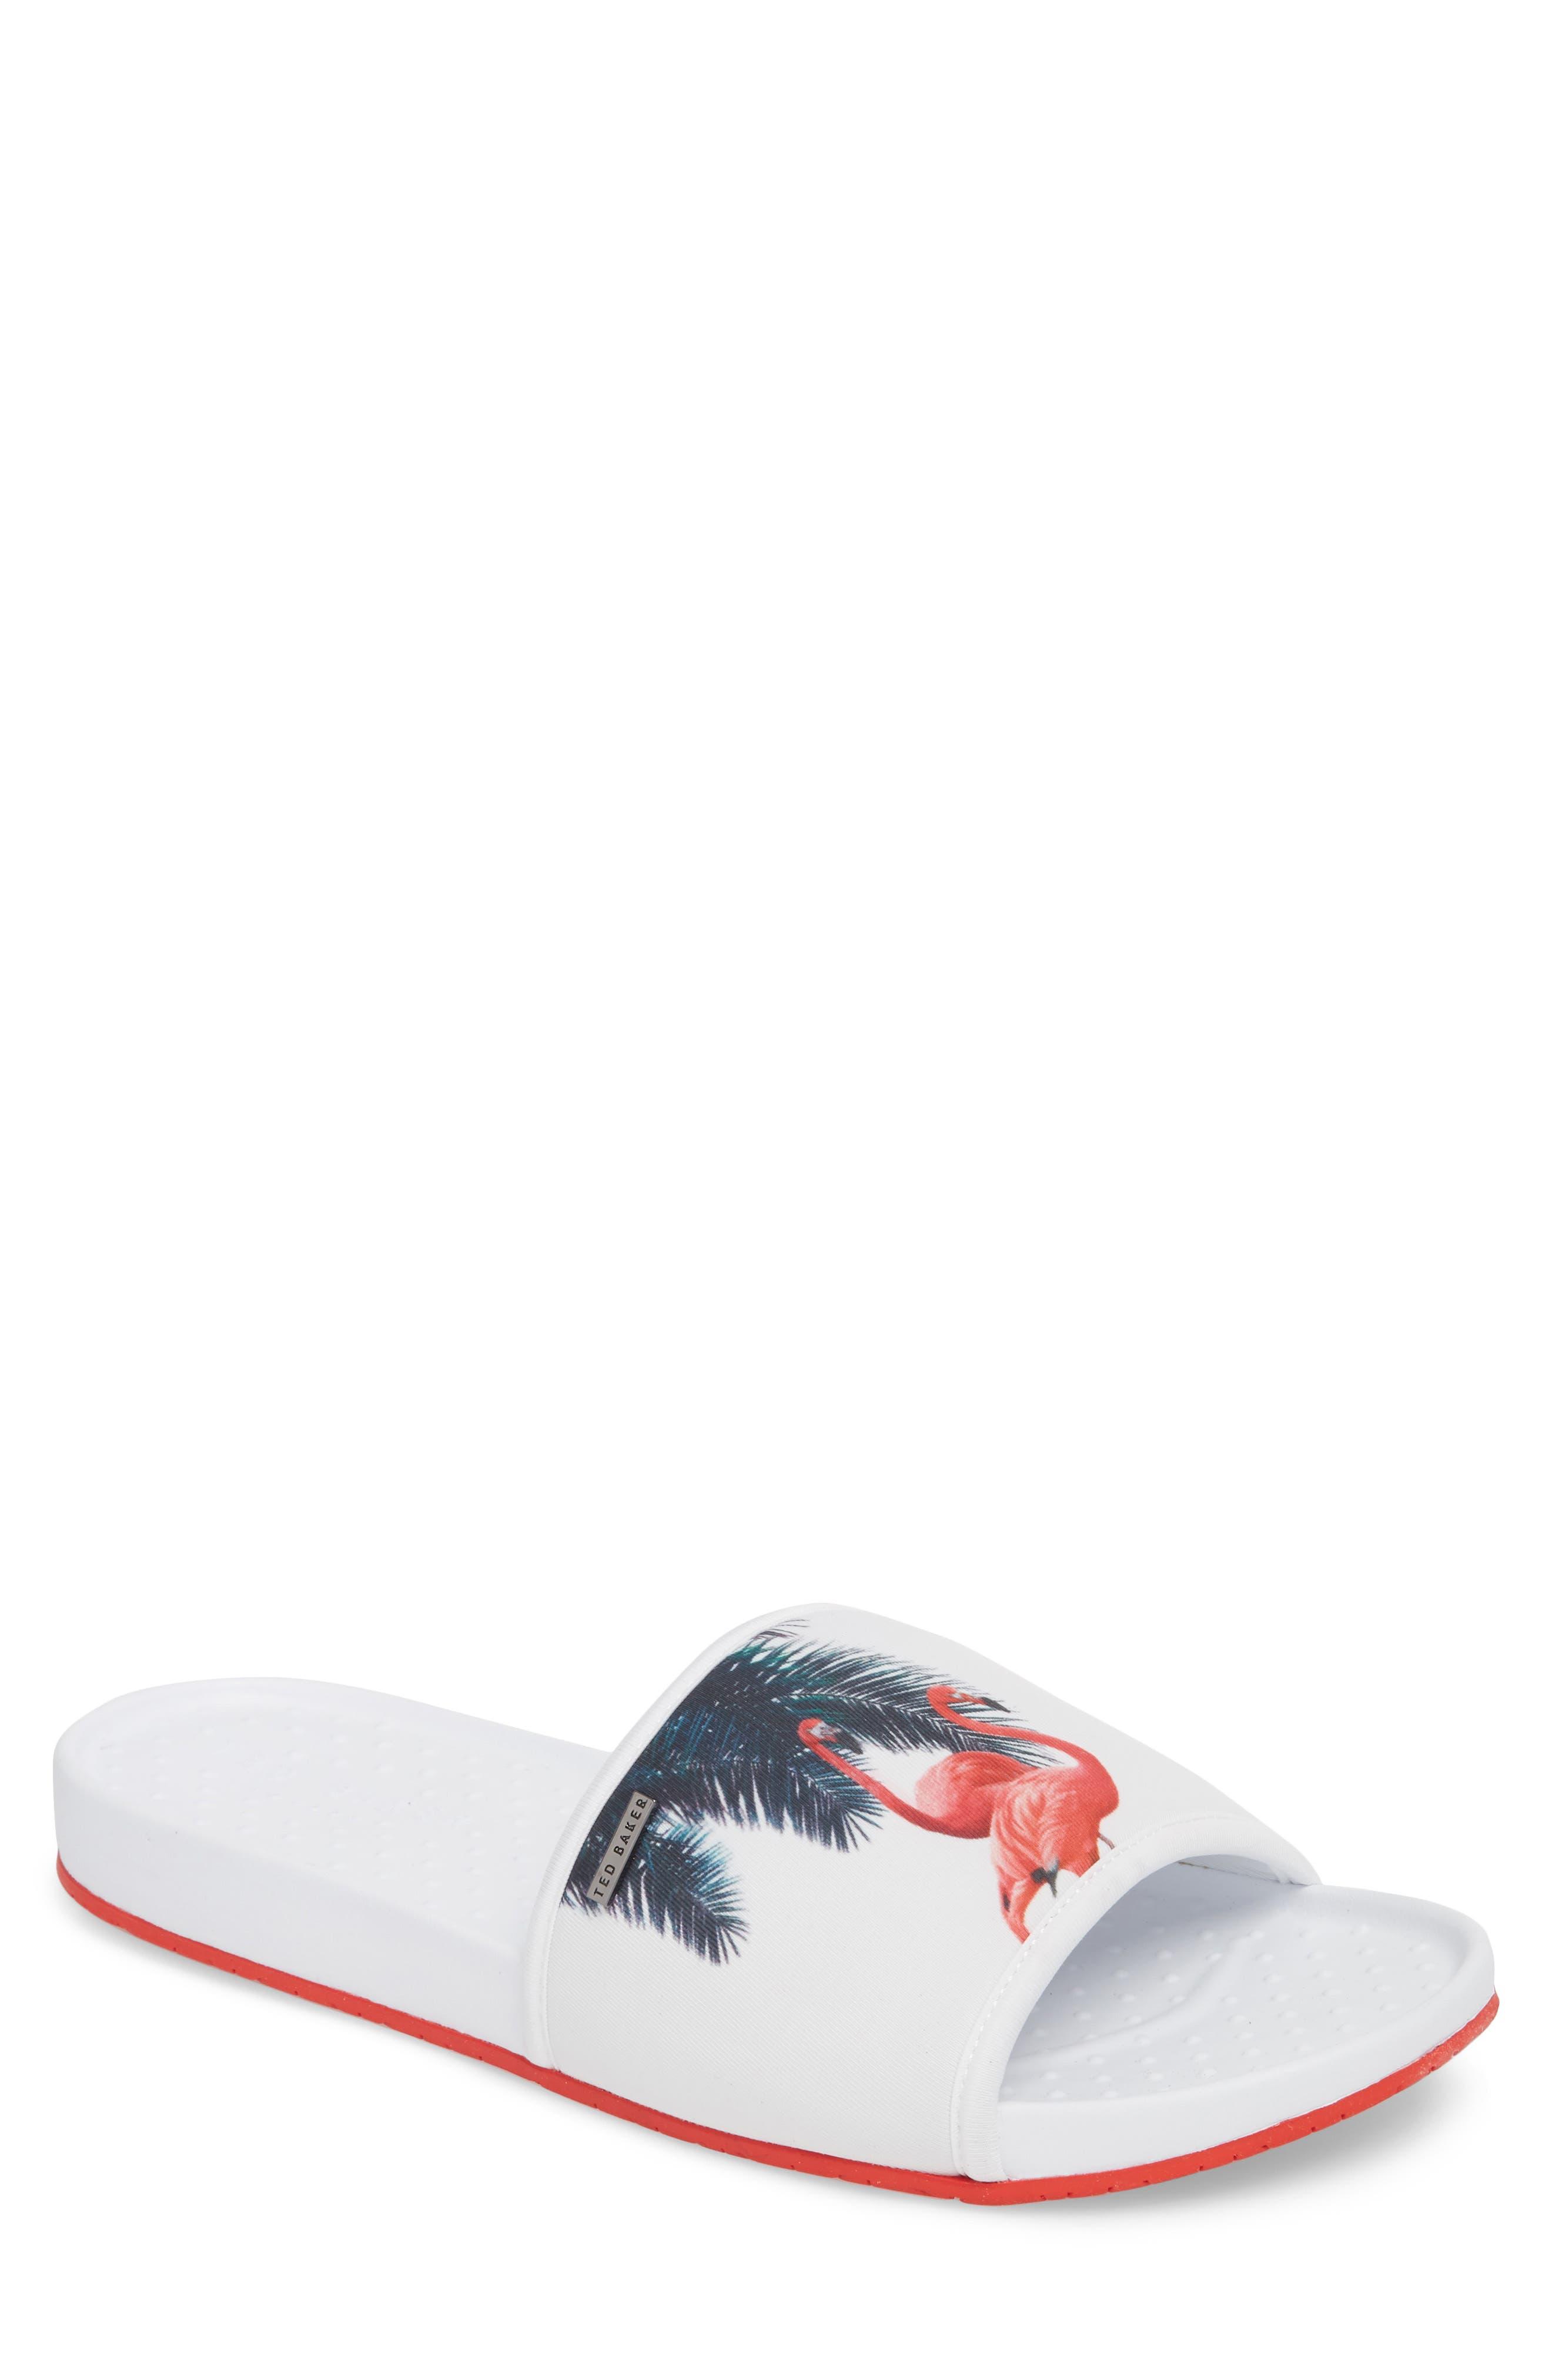 Sauldi 2 Slide Sandal,                         Main,                         color, White/ Red Textile